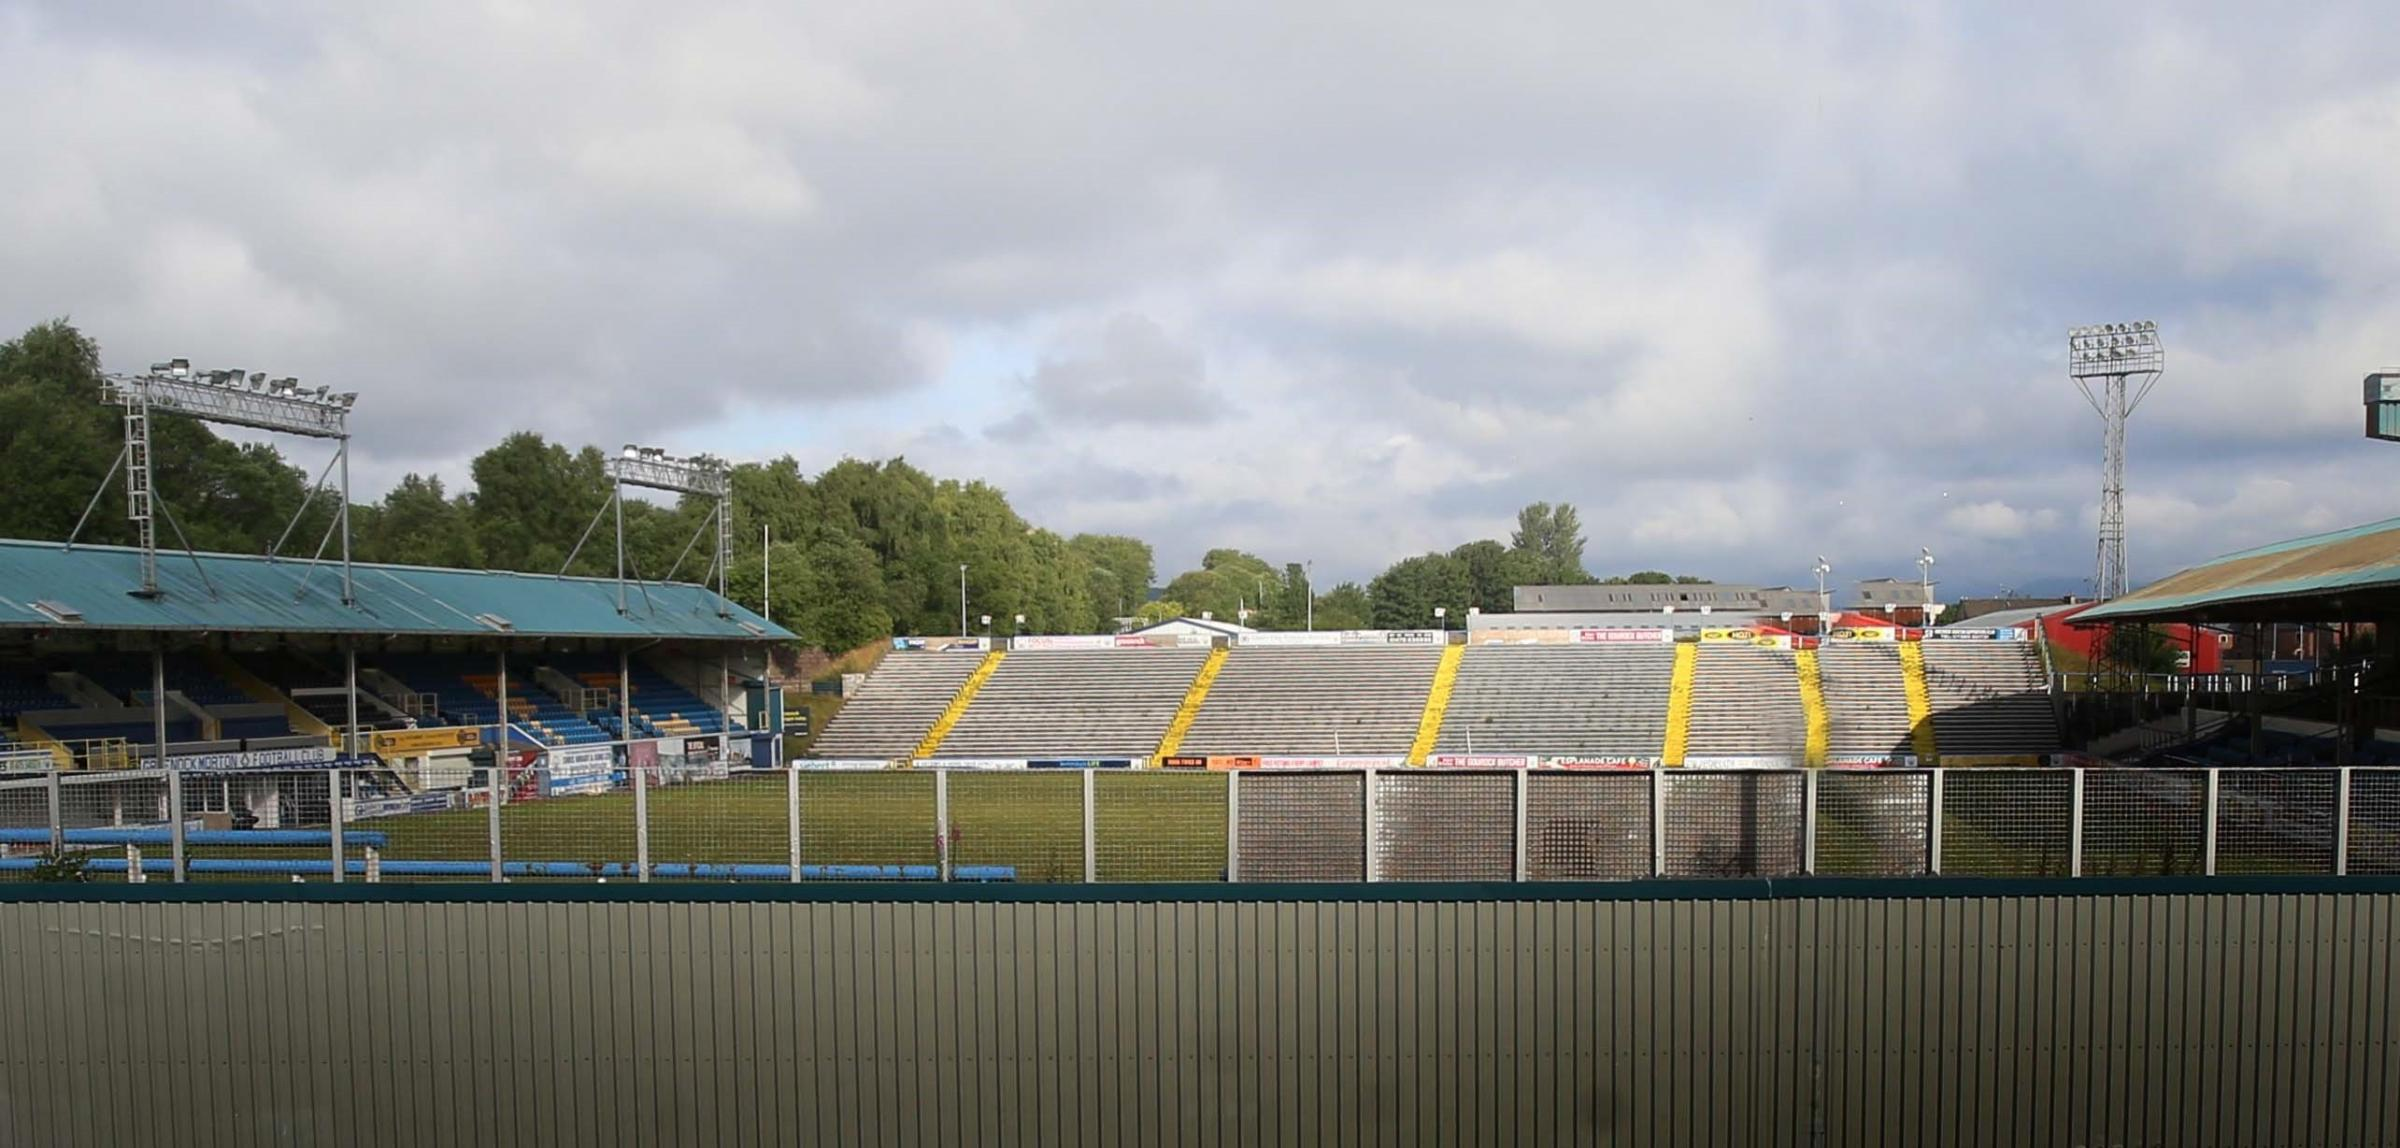 Inverclyde Council approve 1,500 crowd for Morton match